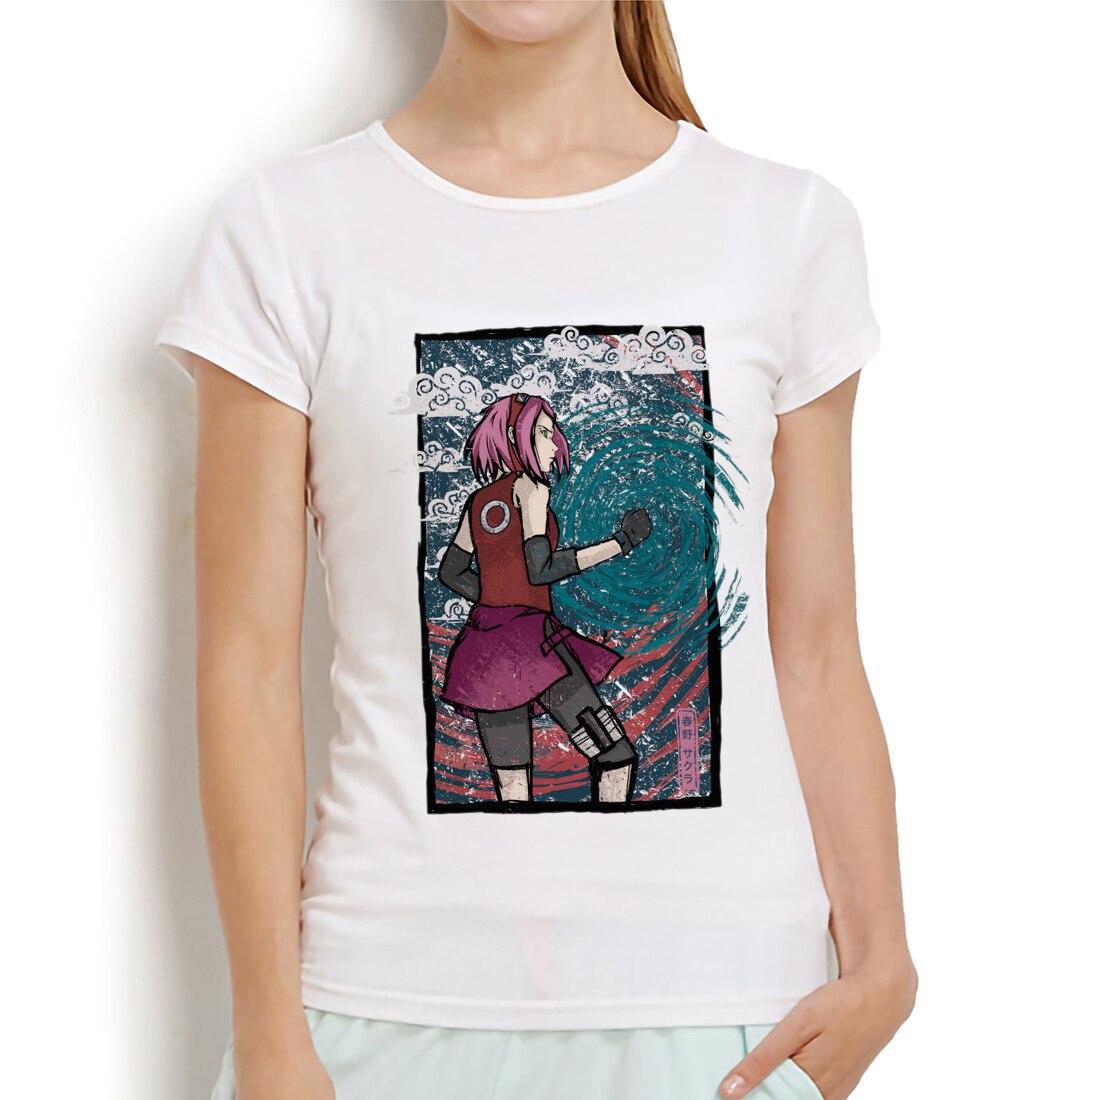 Naruto manga Haruno Sakura divertida camiseta de anime mujeres novedad de verano pantalón corto casual manga camiseta mujer linda streetwear camiseta